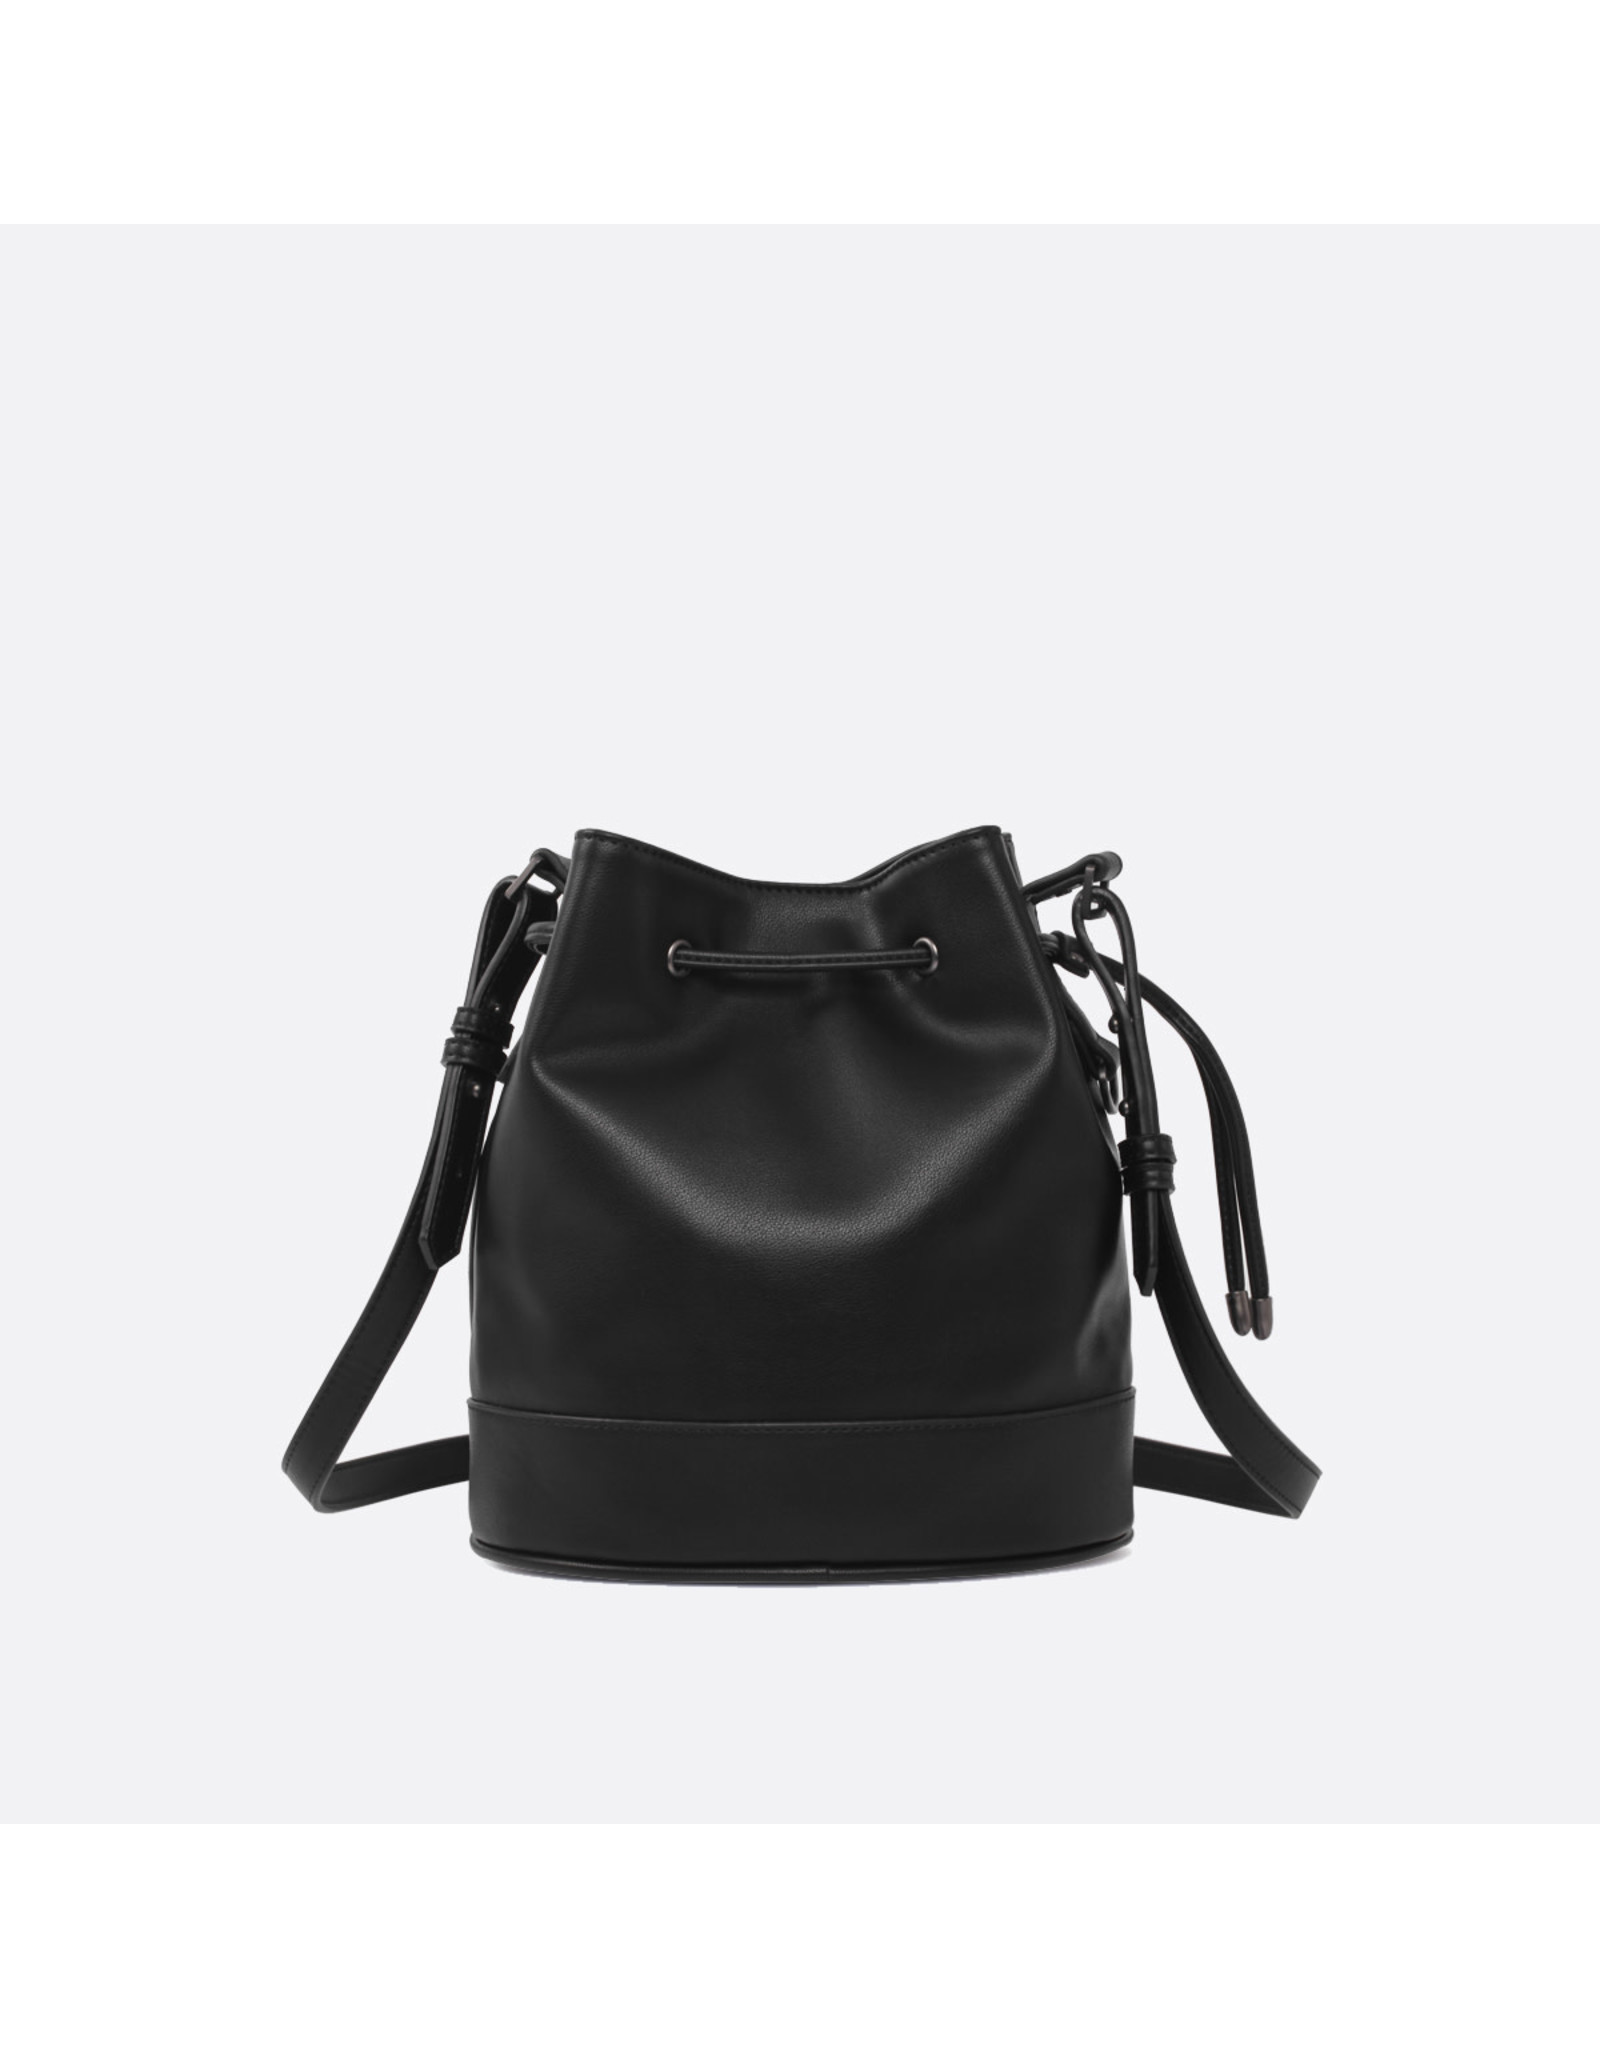 Pixie Mood - Bucket Bag Amber Black